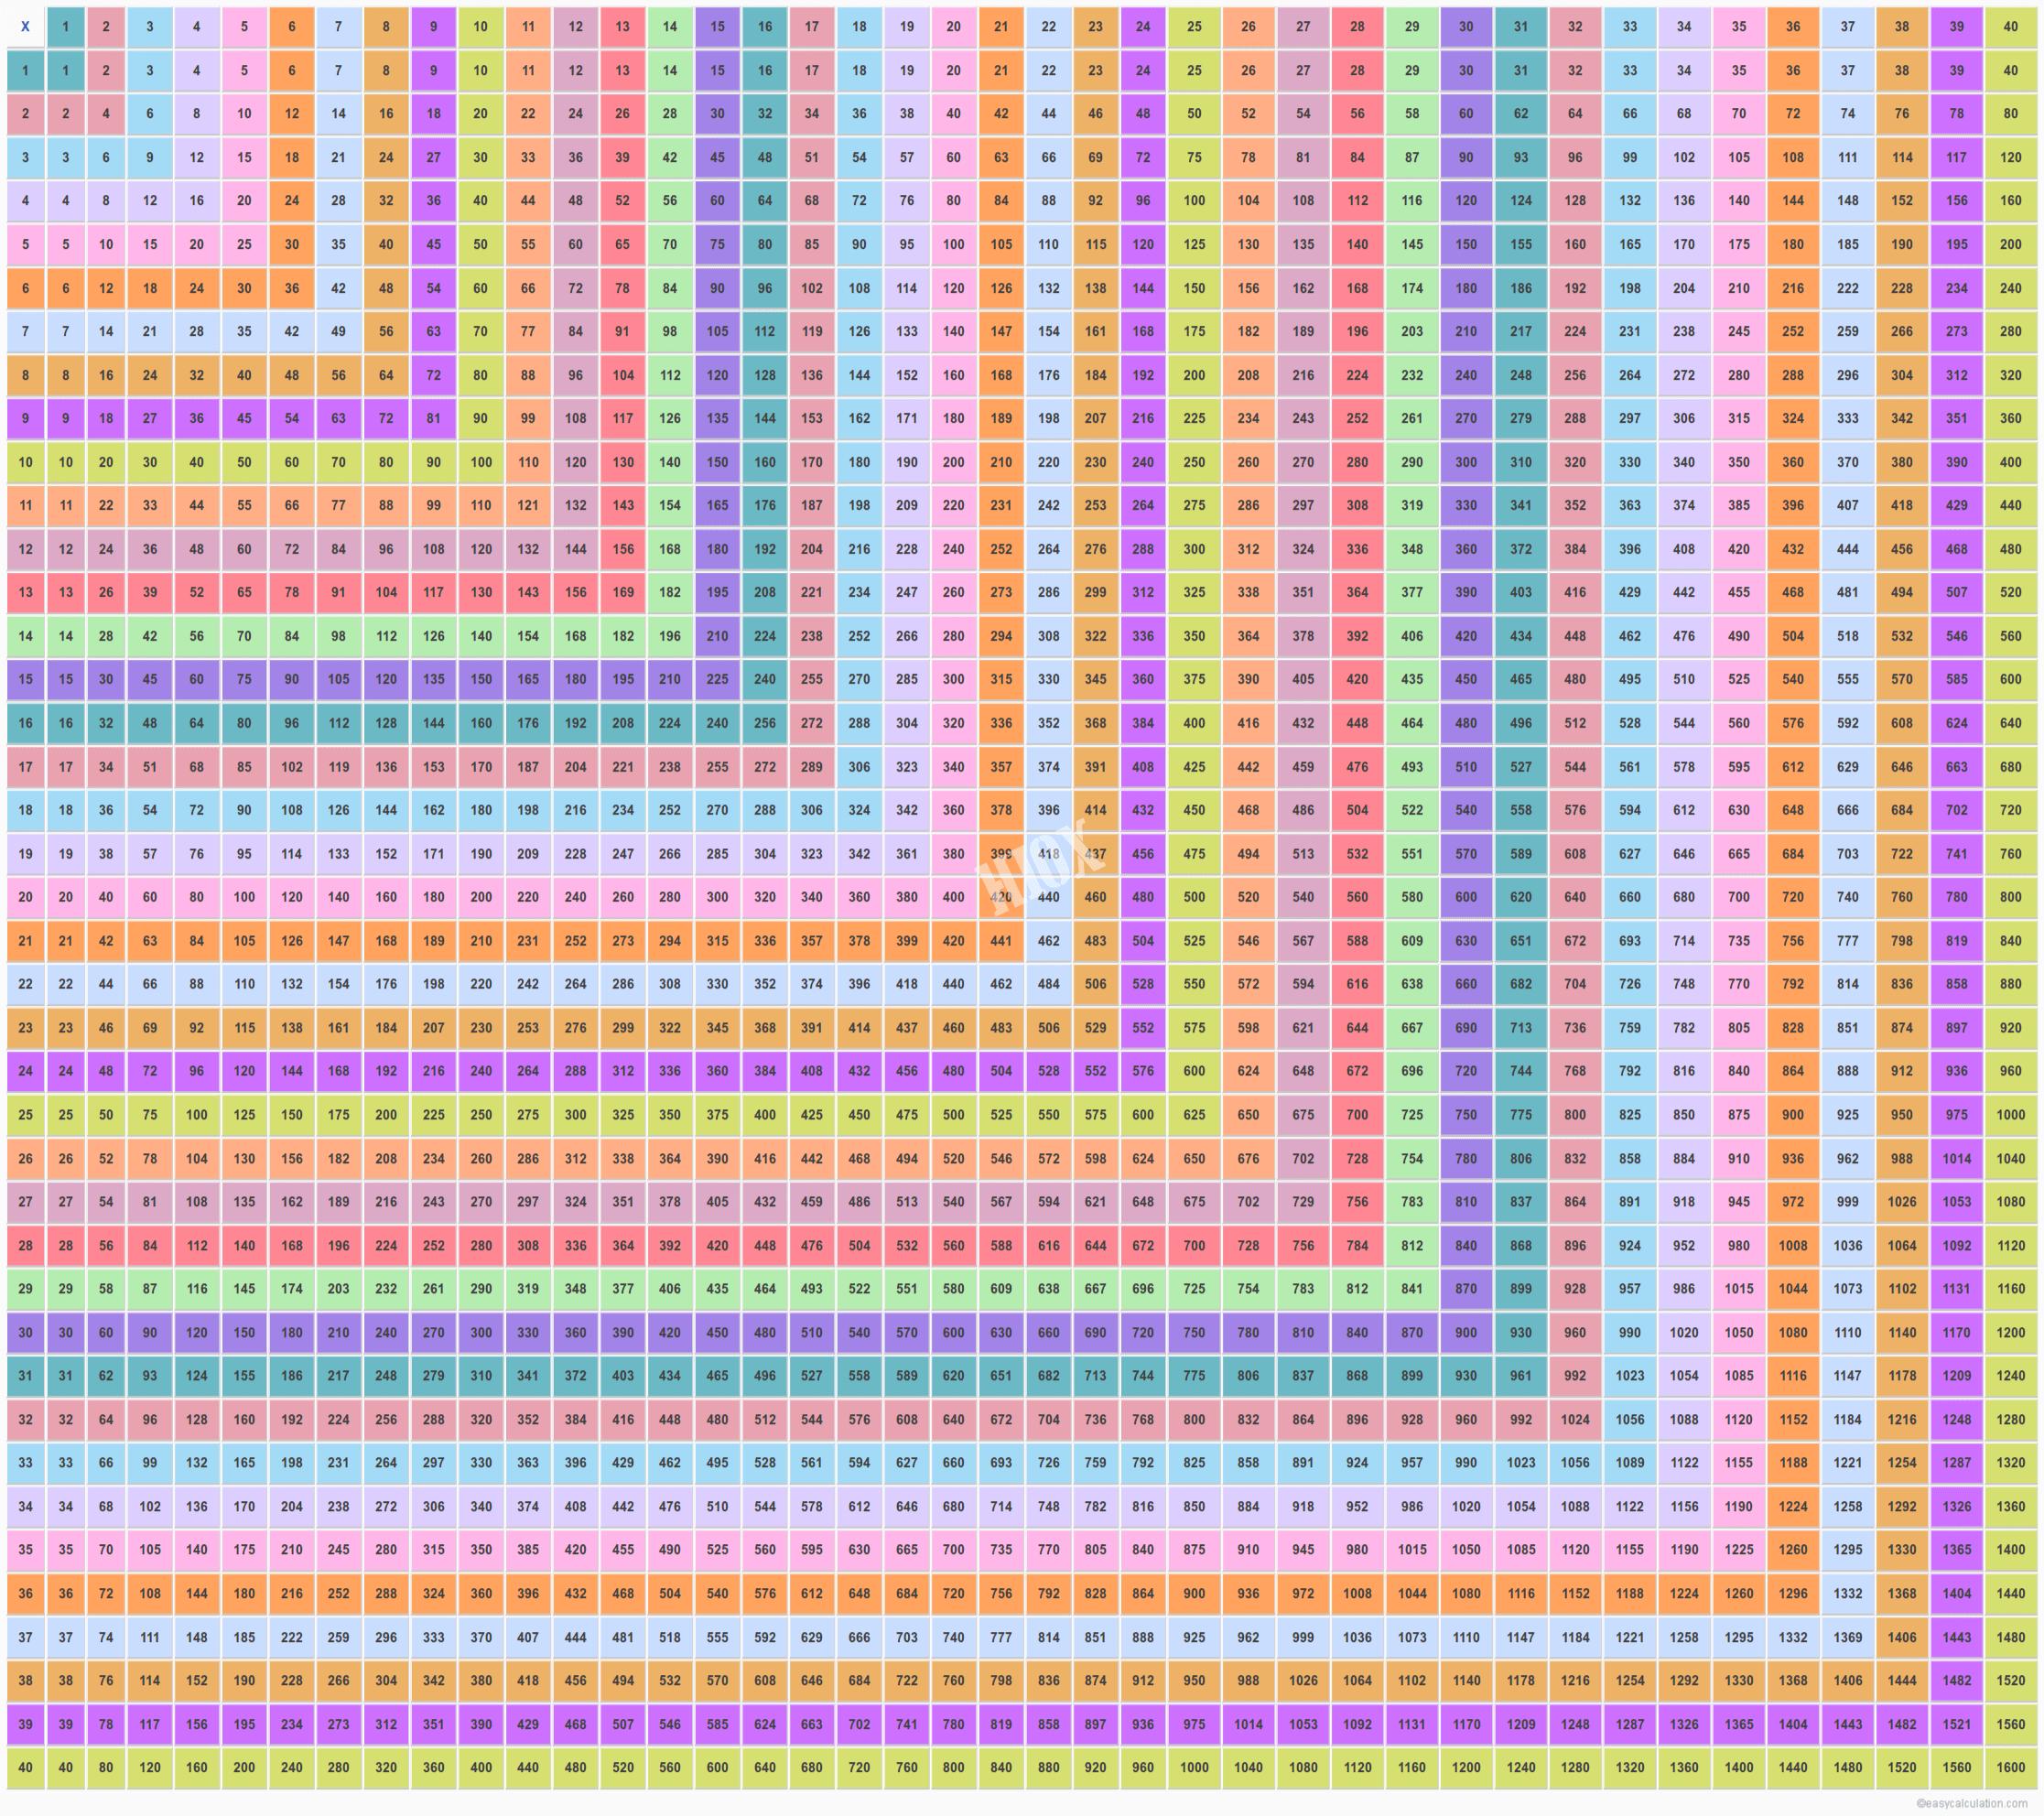 40×40 Multiplication Table | Multiplication Table | Times